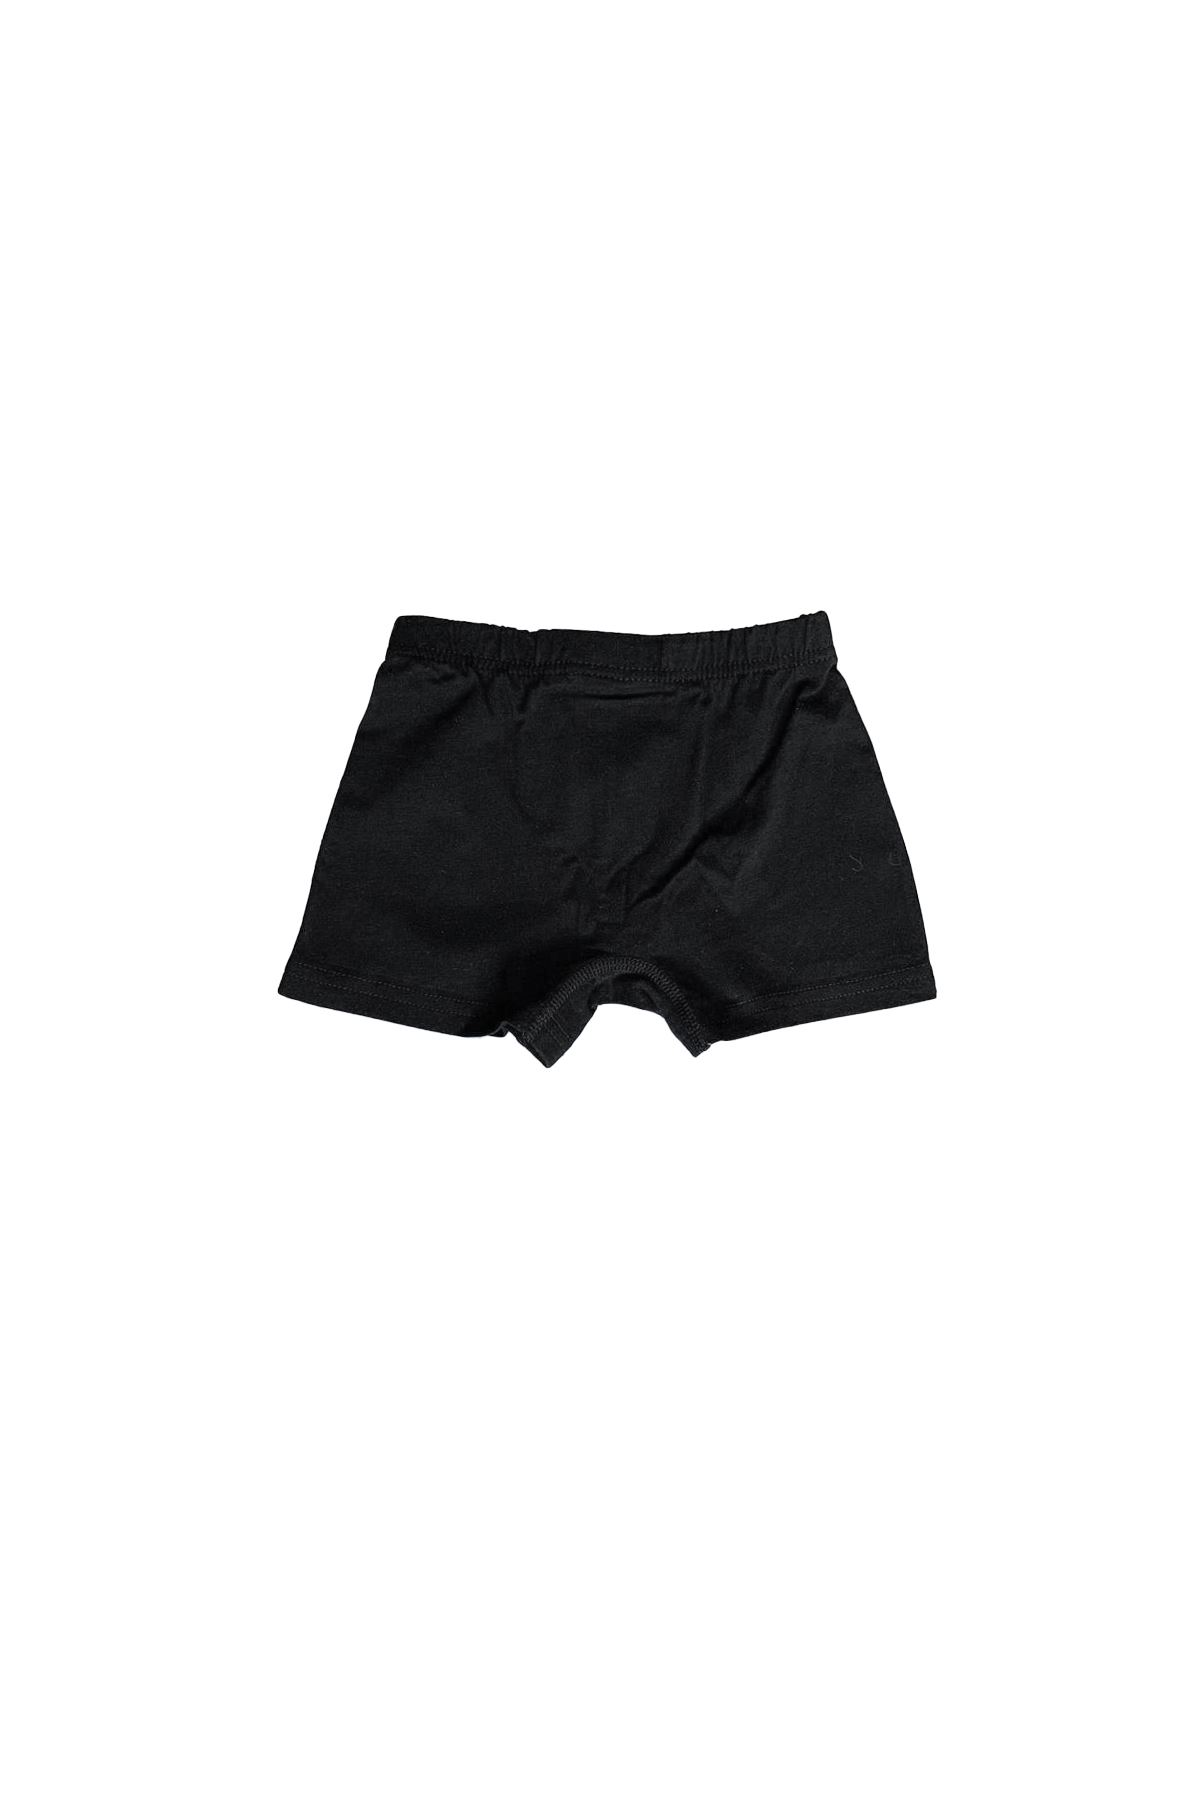 Siyah Erkek Çocuk Pamuklu Boxer 209